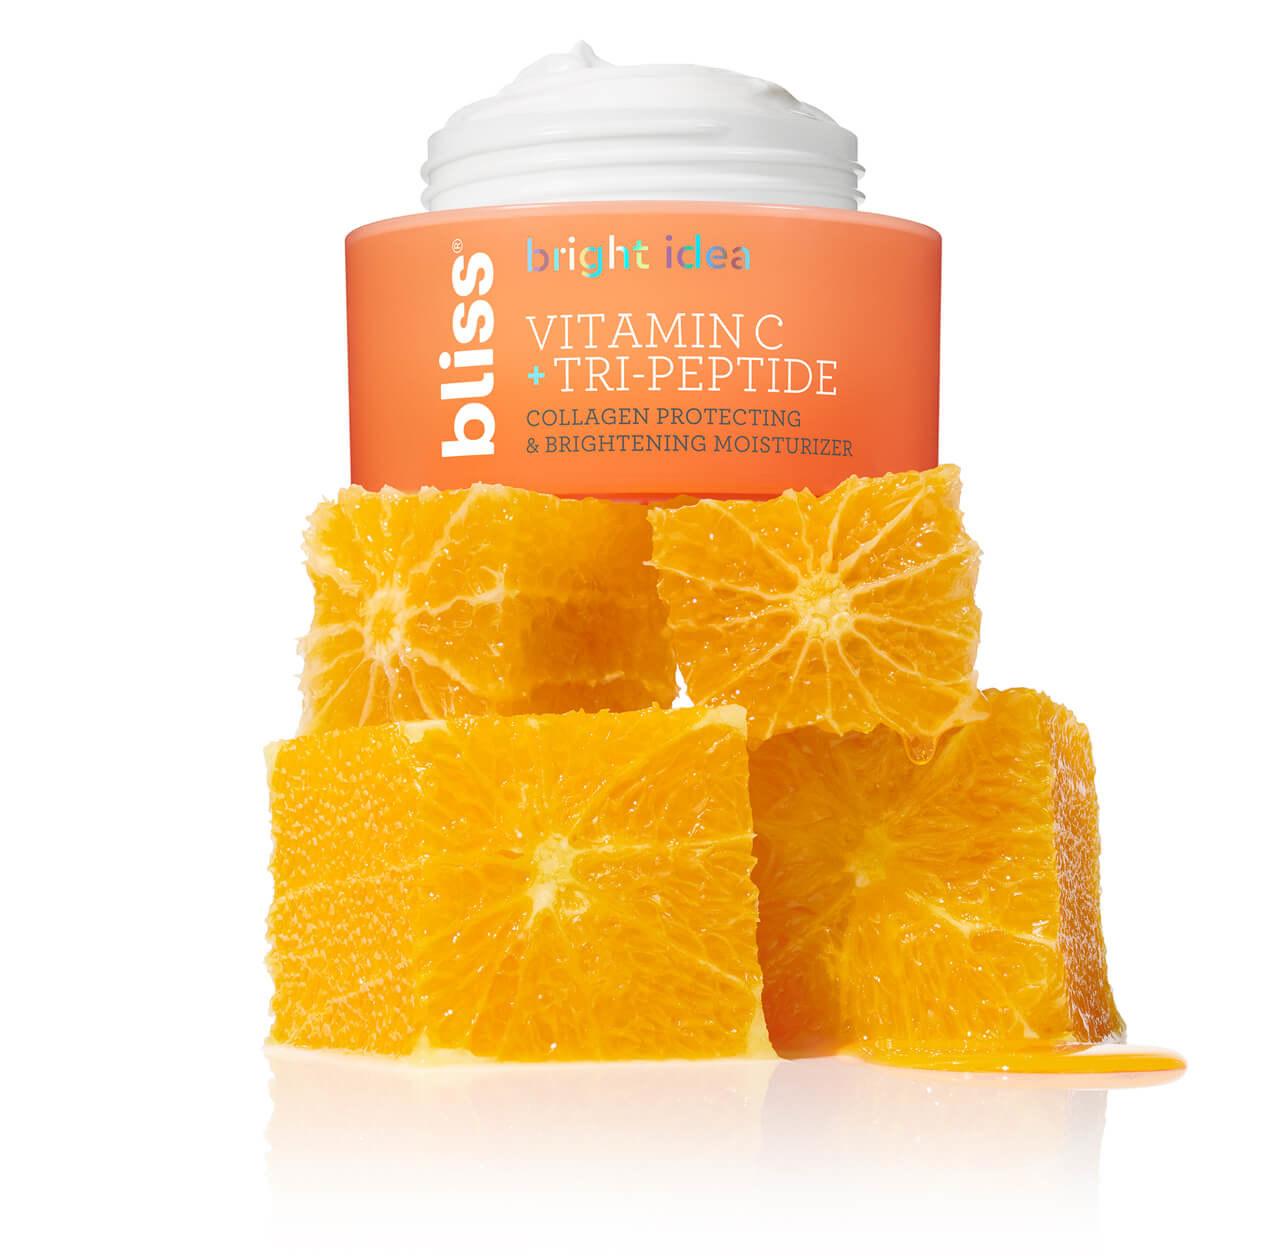 A jar of moisturizer sitting on top of orange chunks